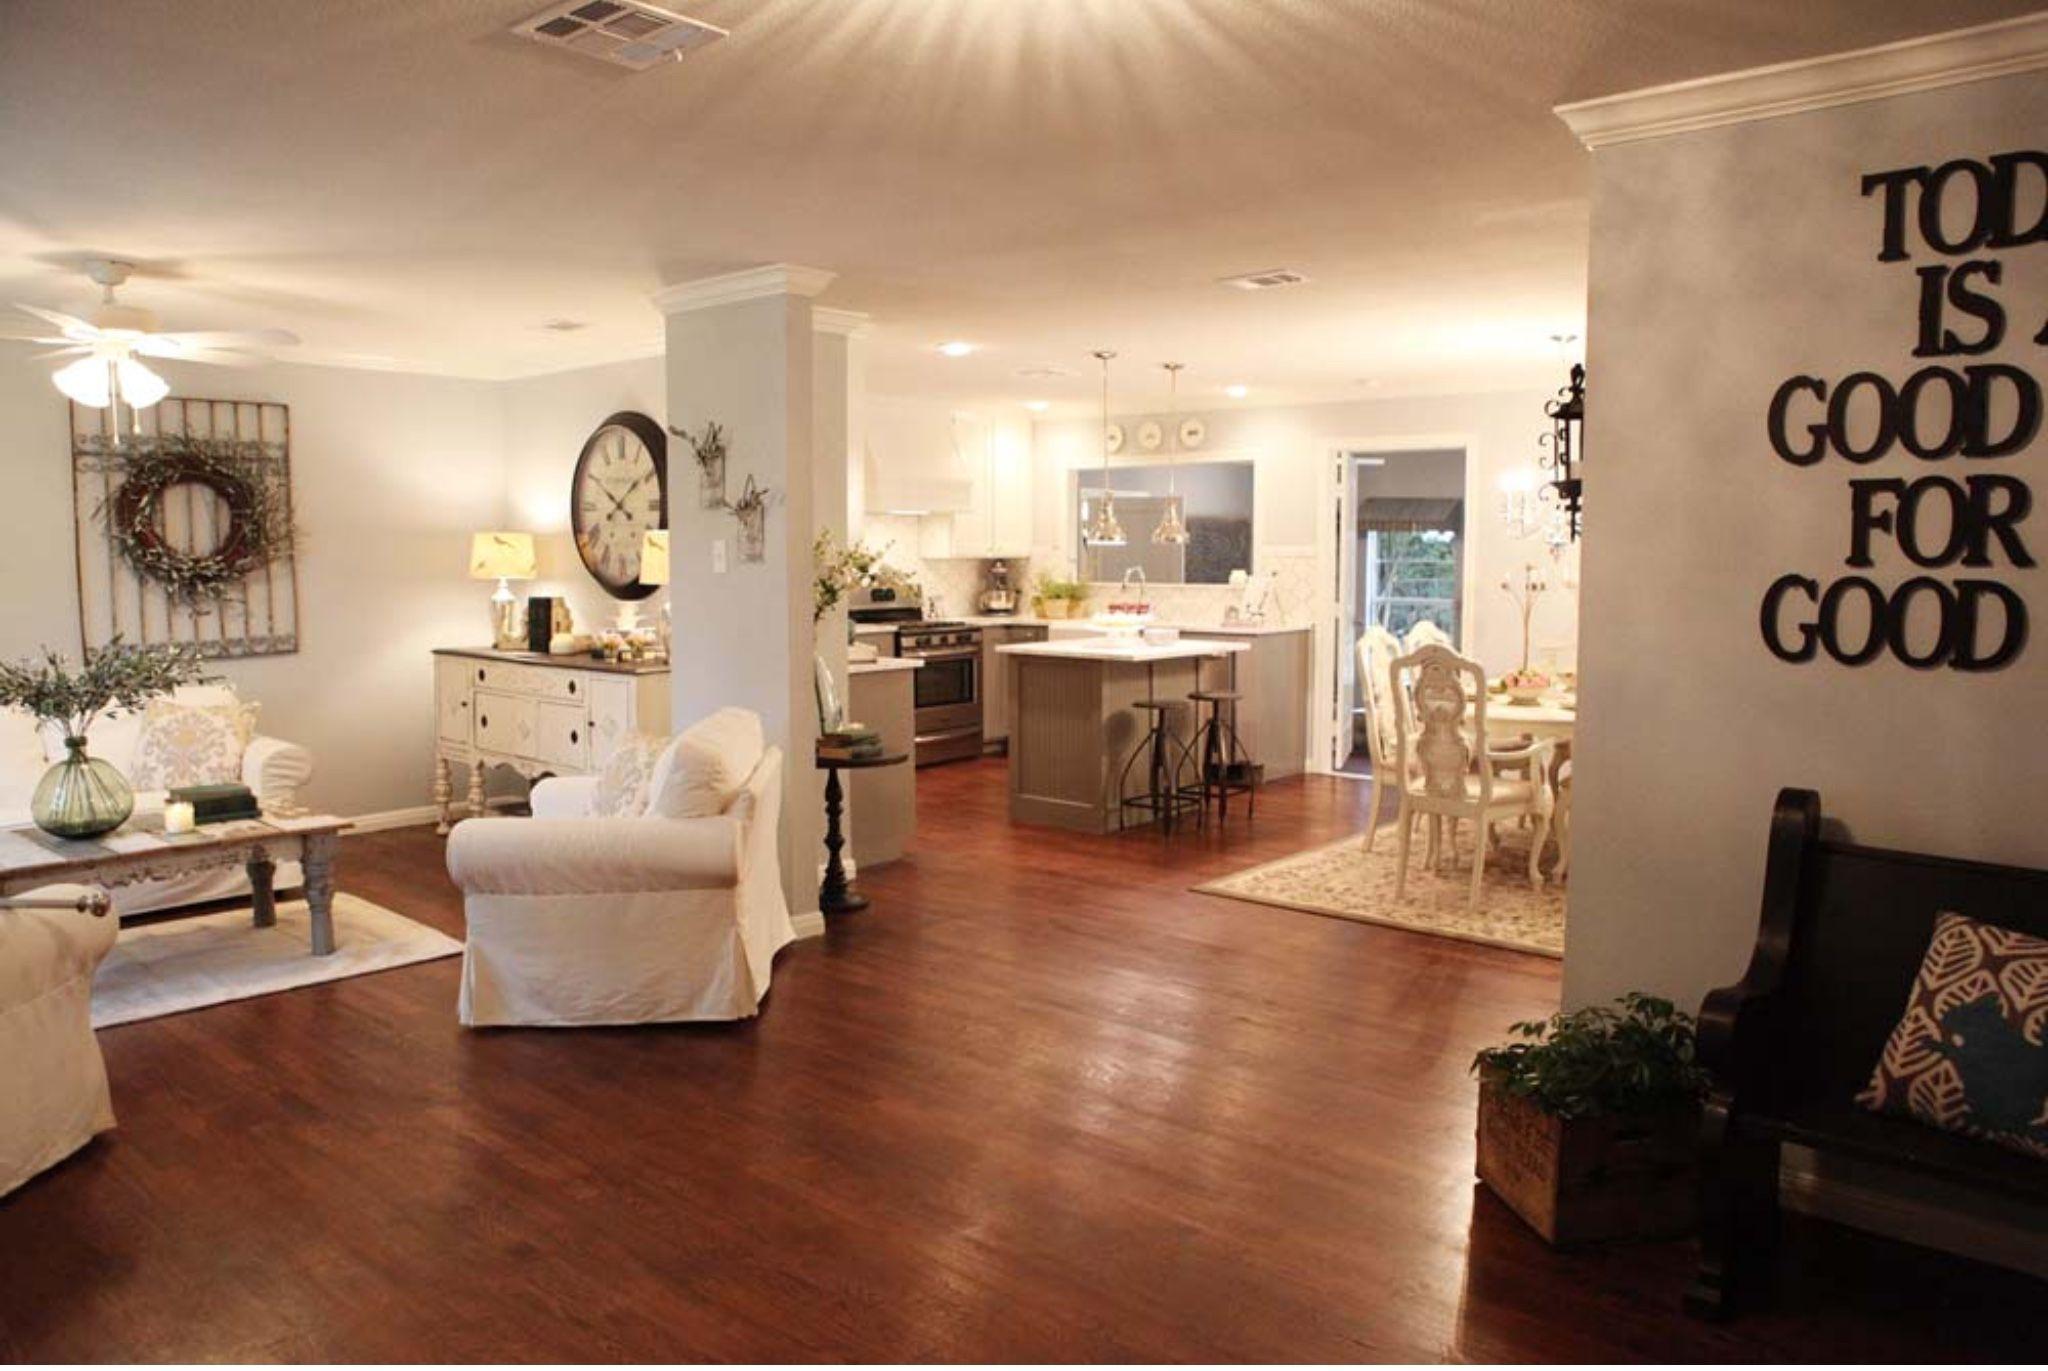 Vintage french soul magnolia mom design pinterest for Living room ideas magnolia